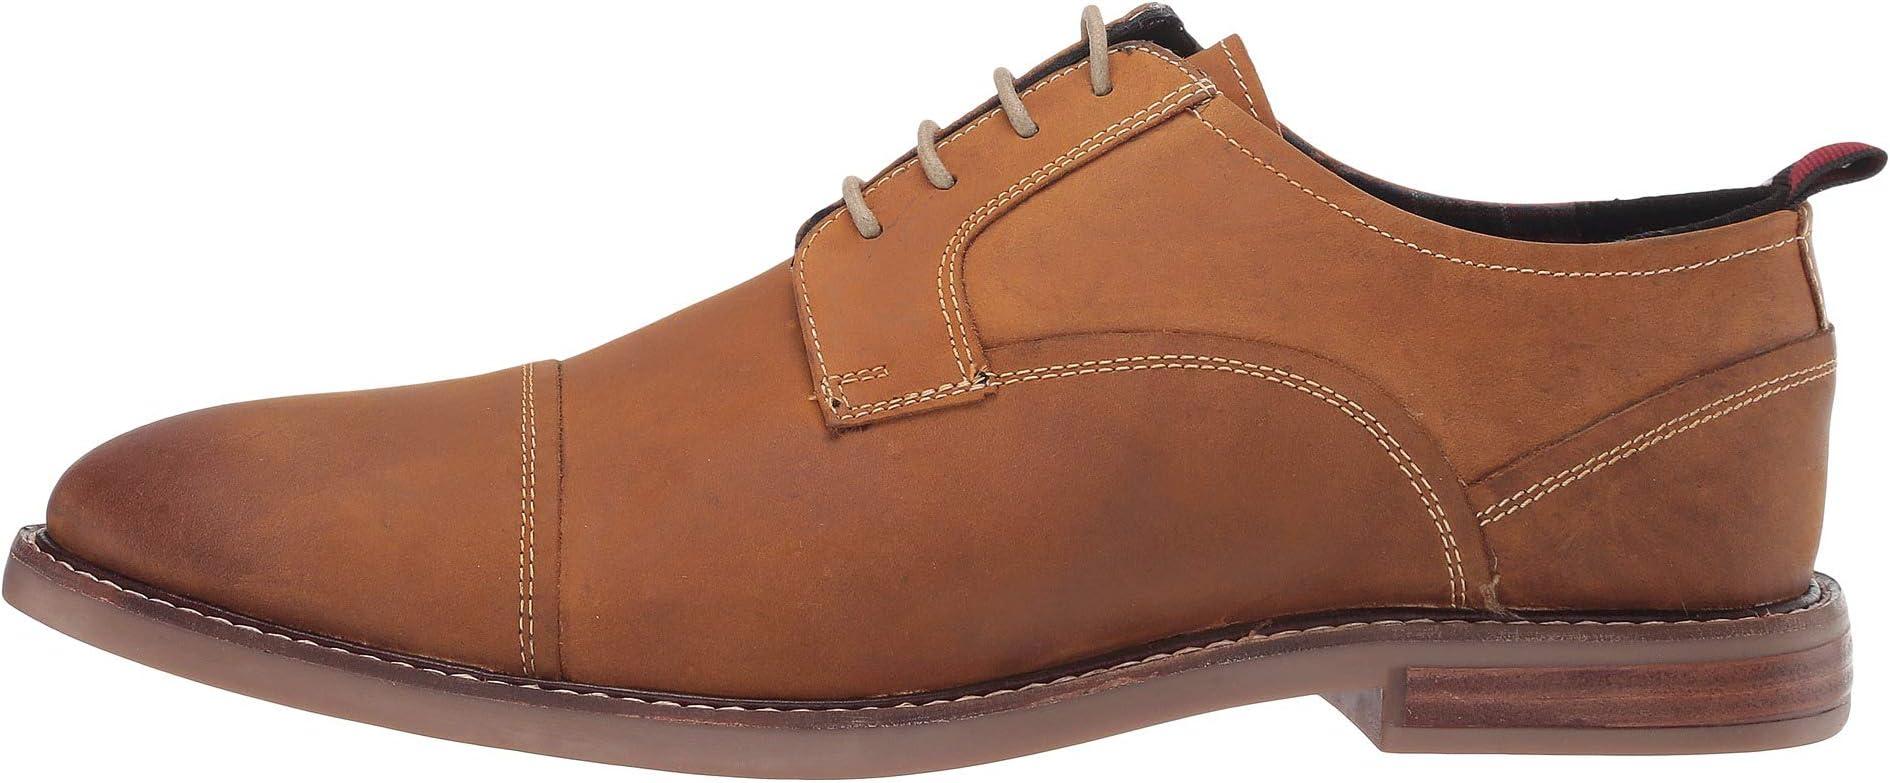 Ben Sherman Brent Cap Toe | Men's shoes | 2020 Newest